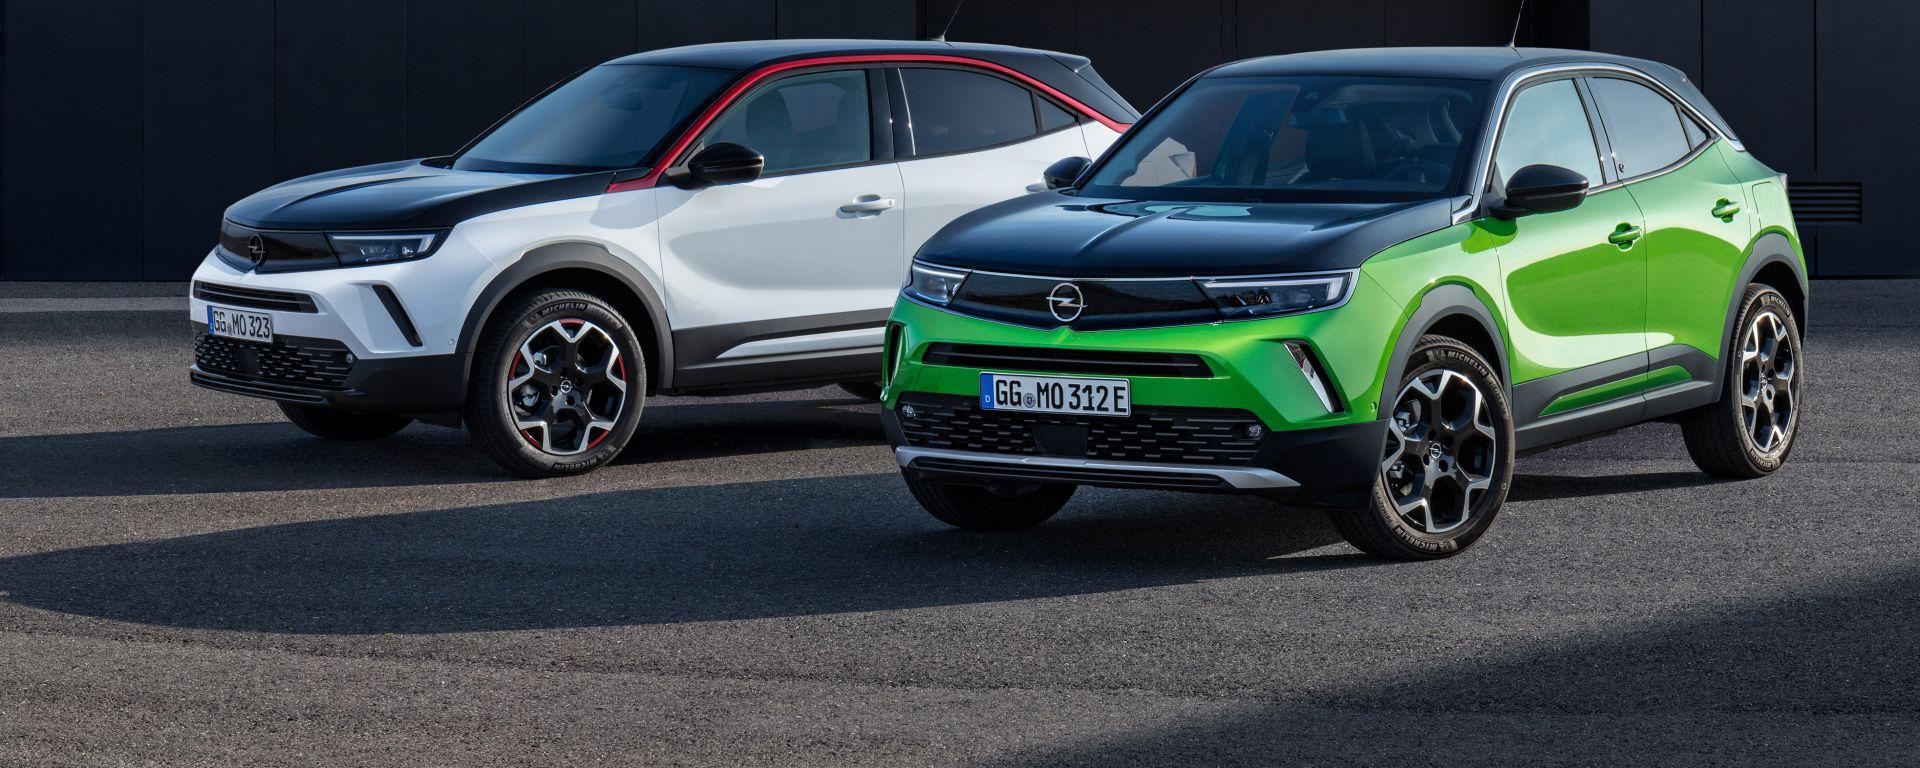 Opel Mokka 2021: versioni GS Line e Ultimate